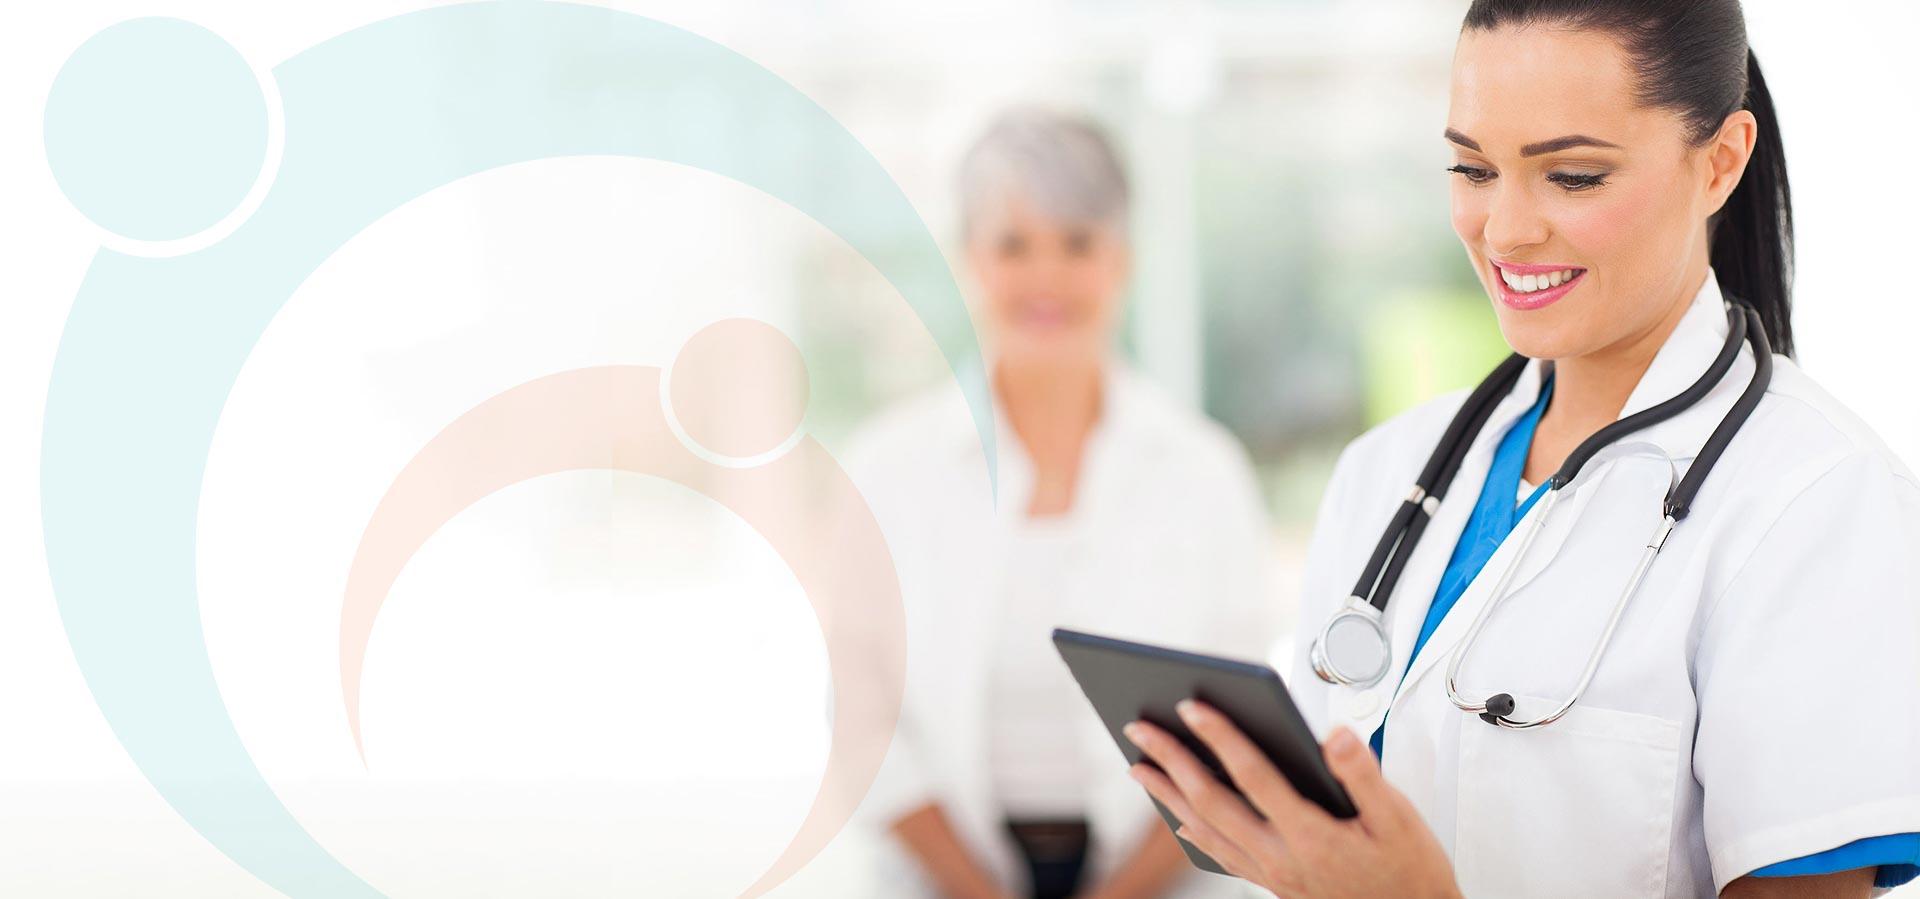 medic zambind in timp ce vizualizeaza rezultate medicale